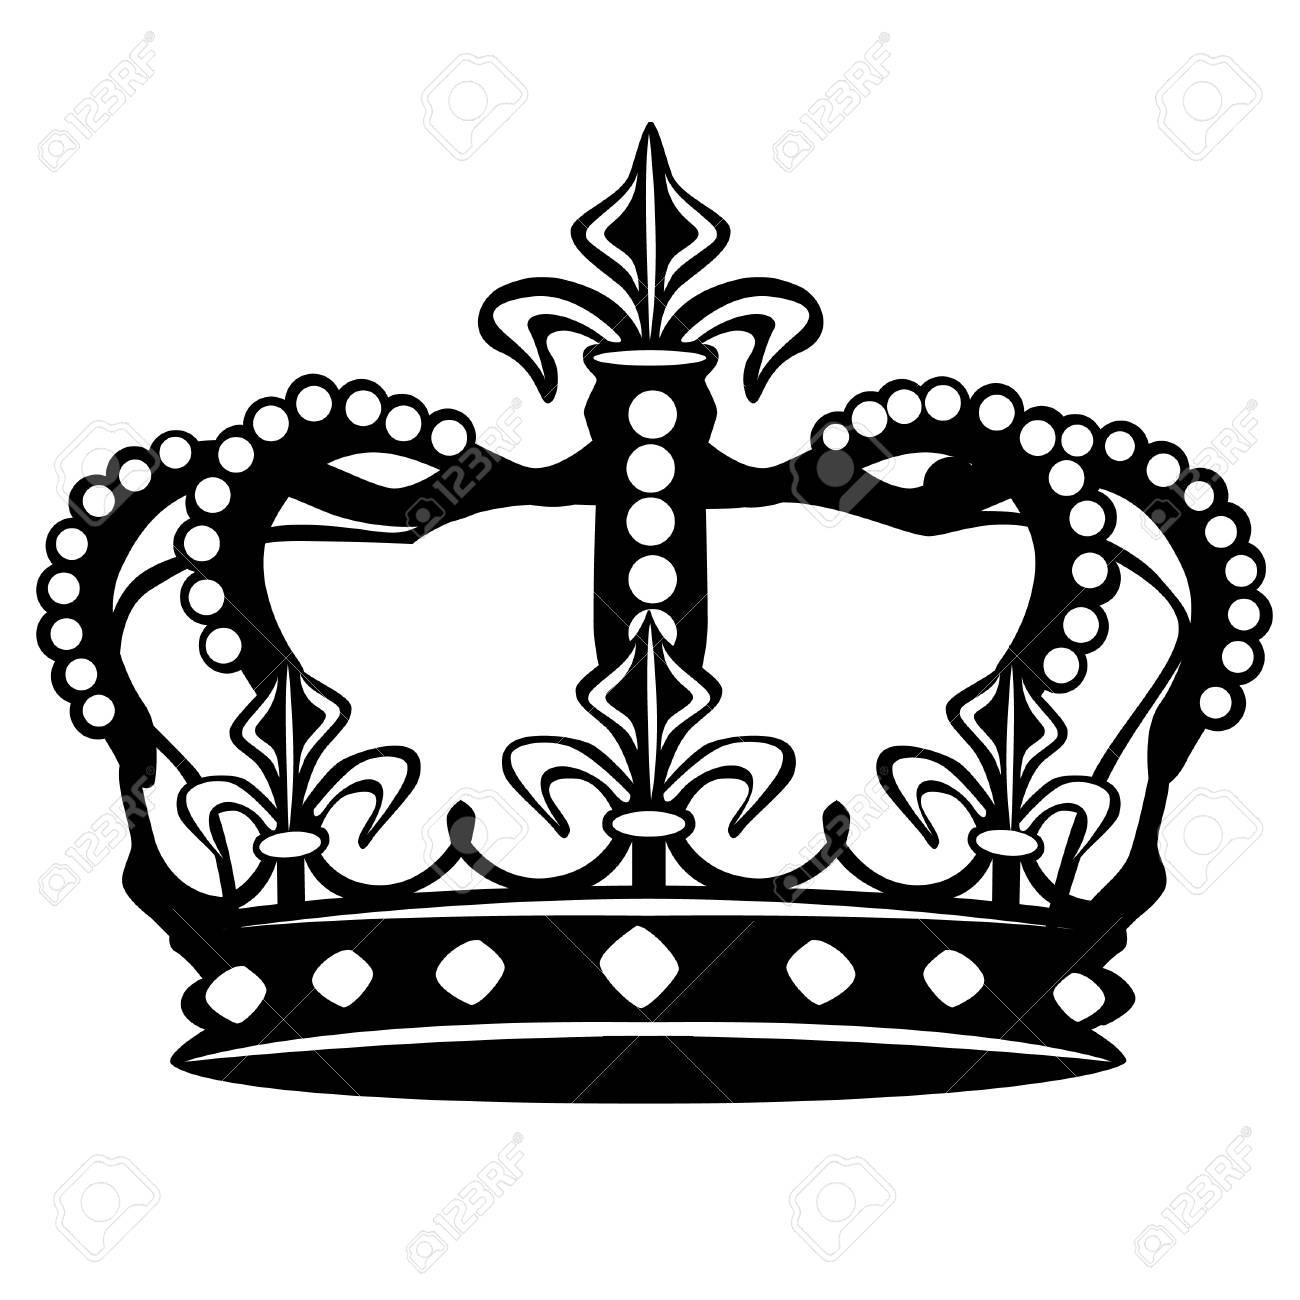 Crown Drawing Vector